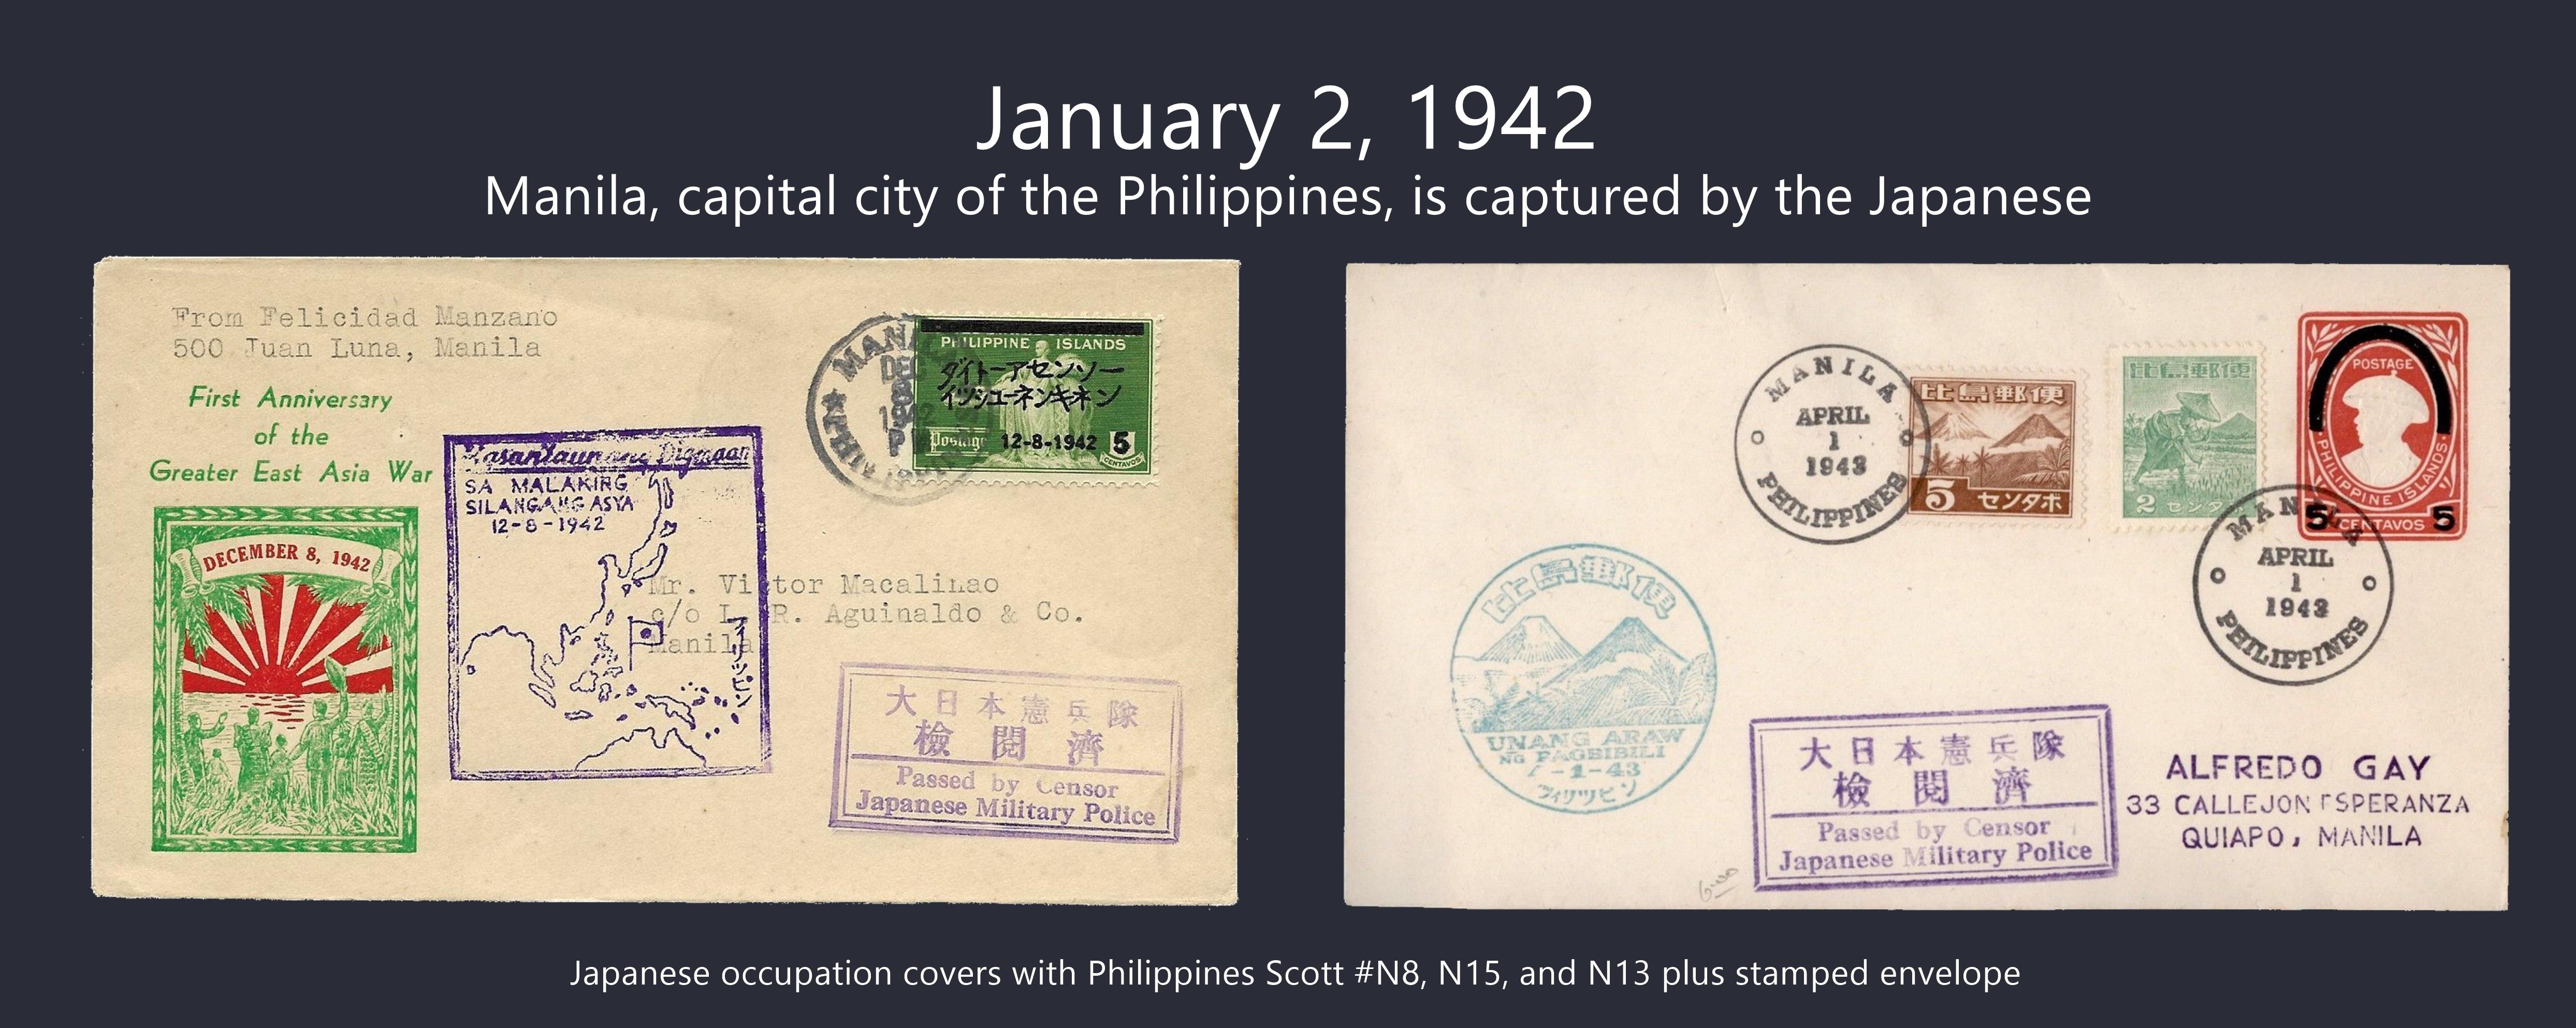 January 2, 1942